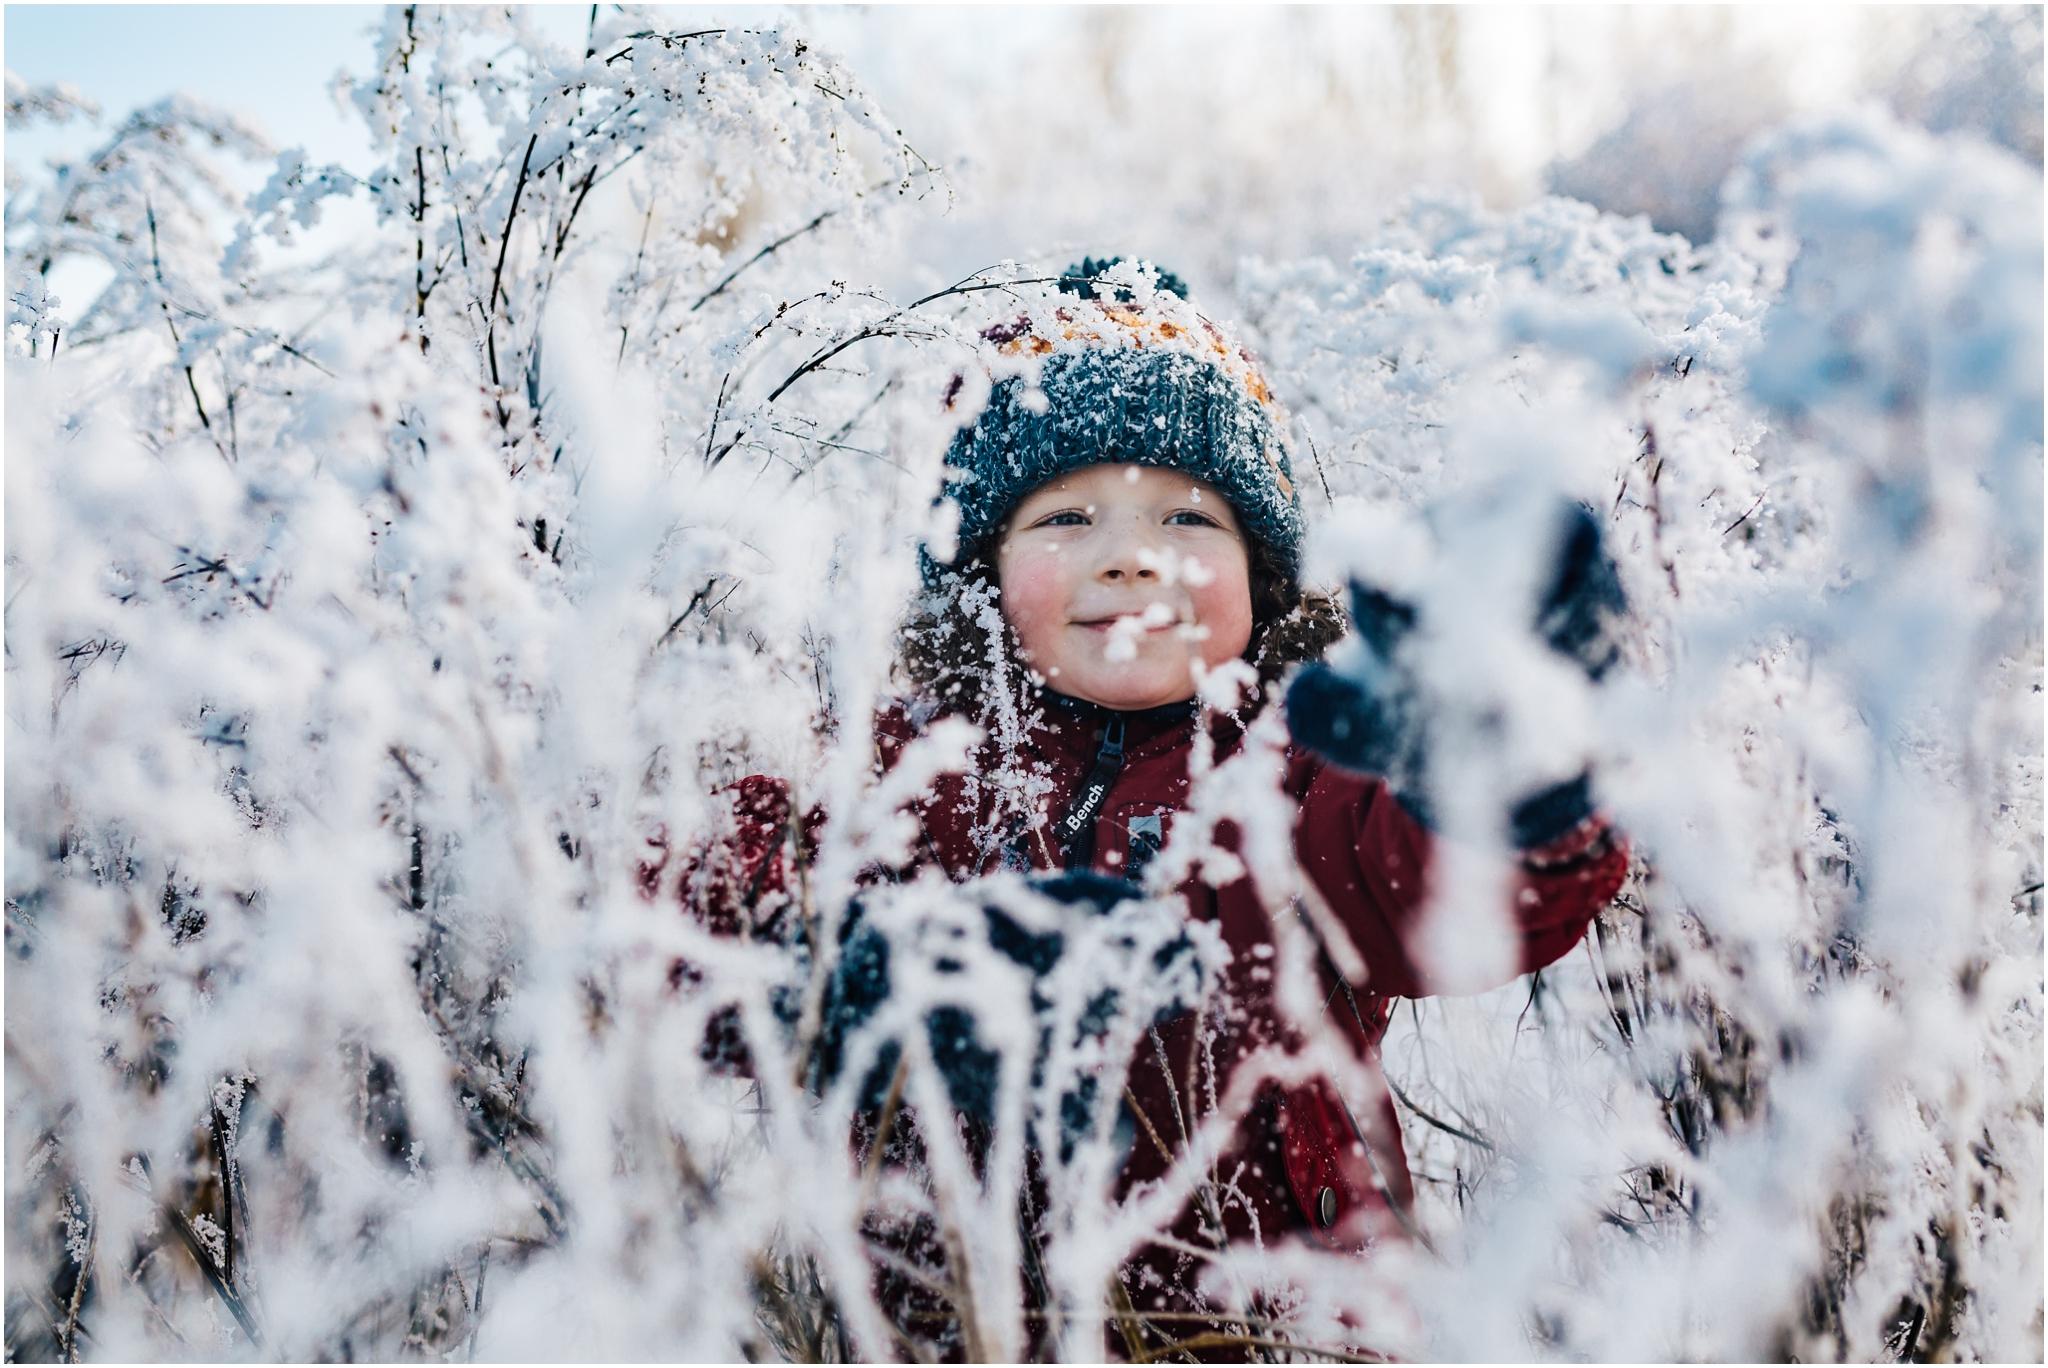 Treelines Photography - Edmonton Lifestyle Photographer - Hoar Frost Adventure